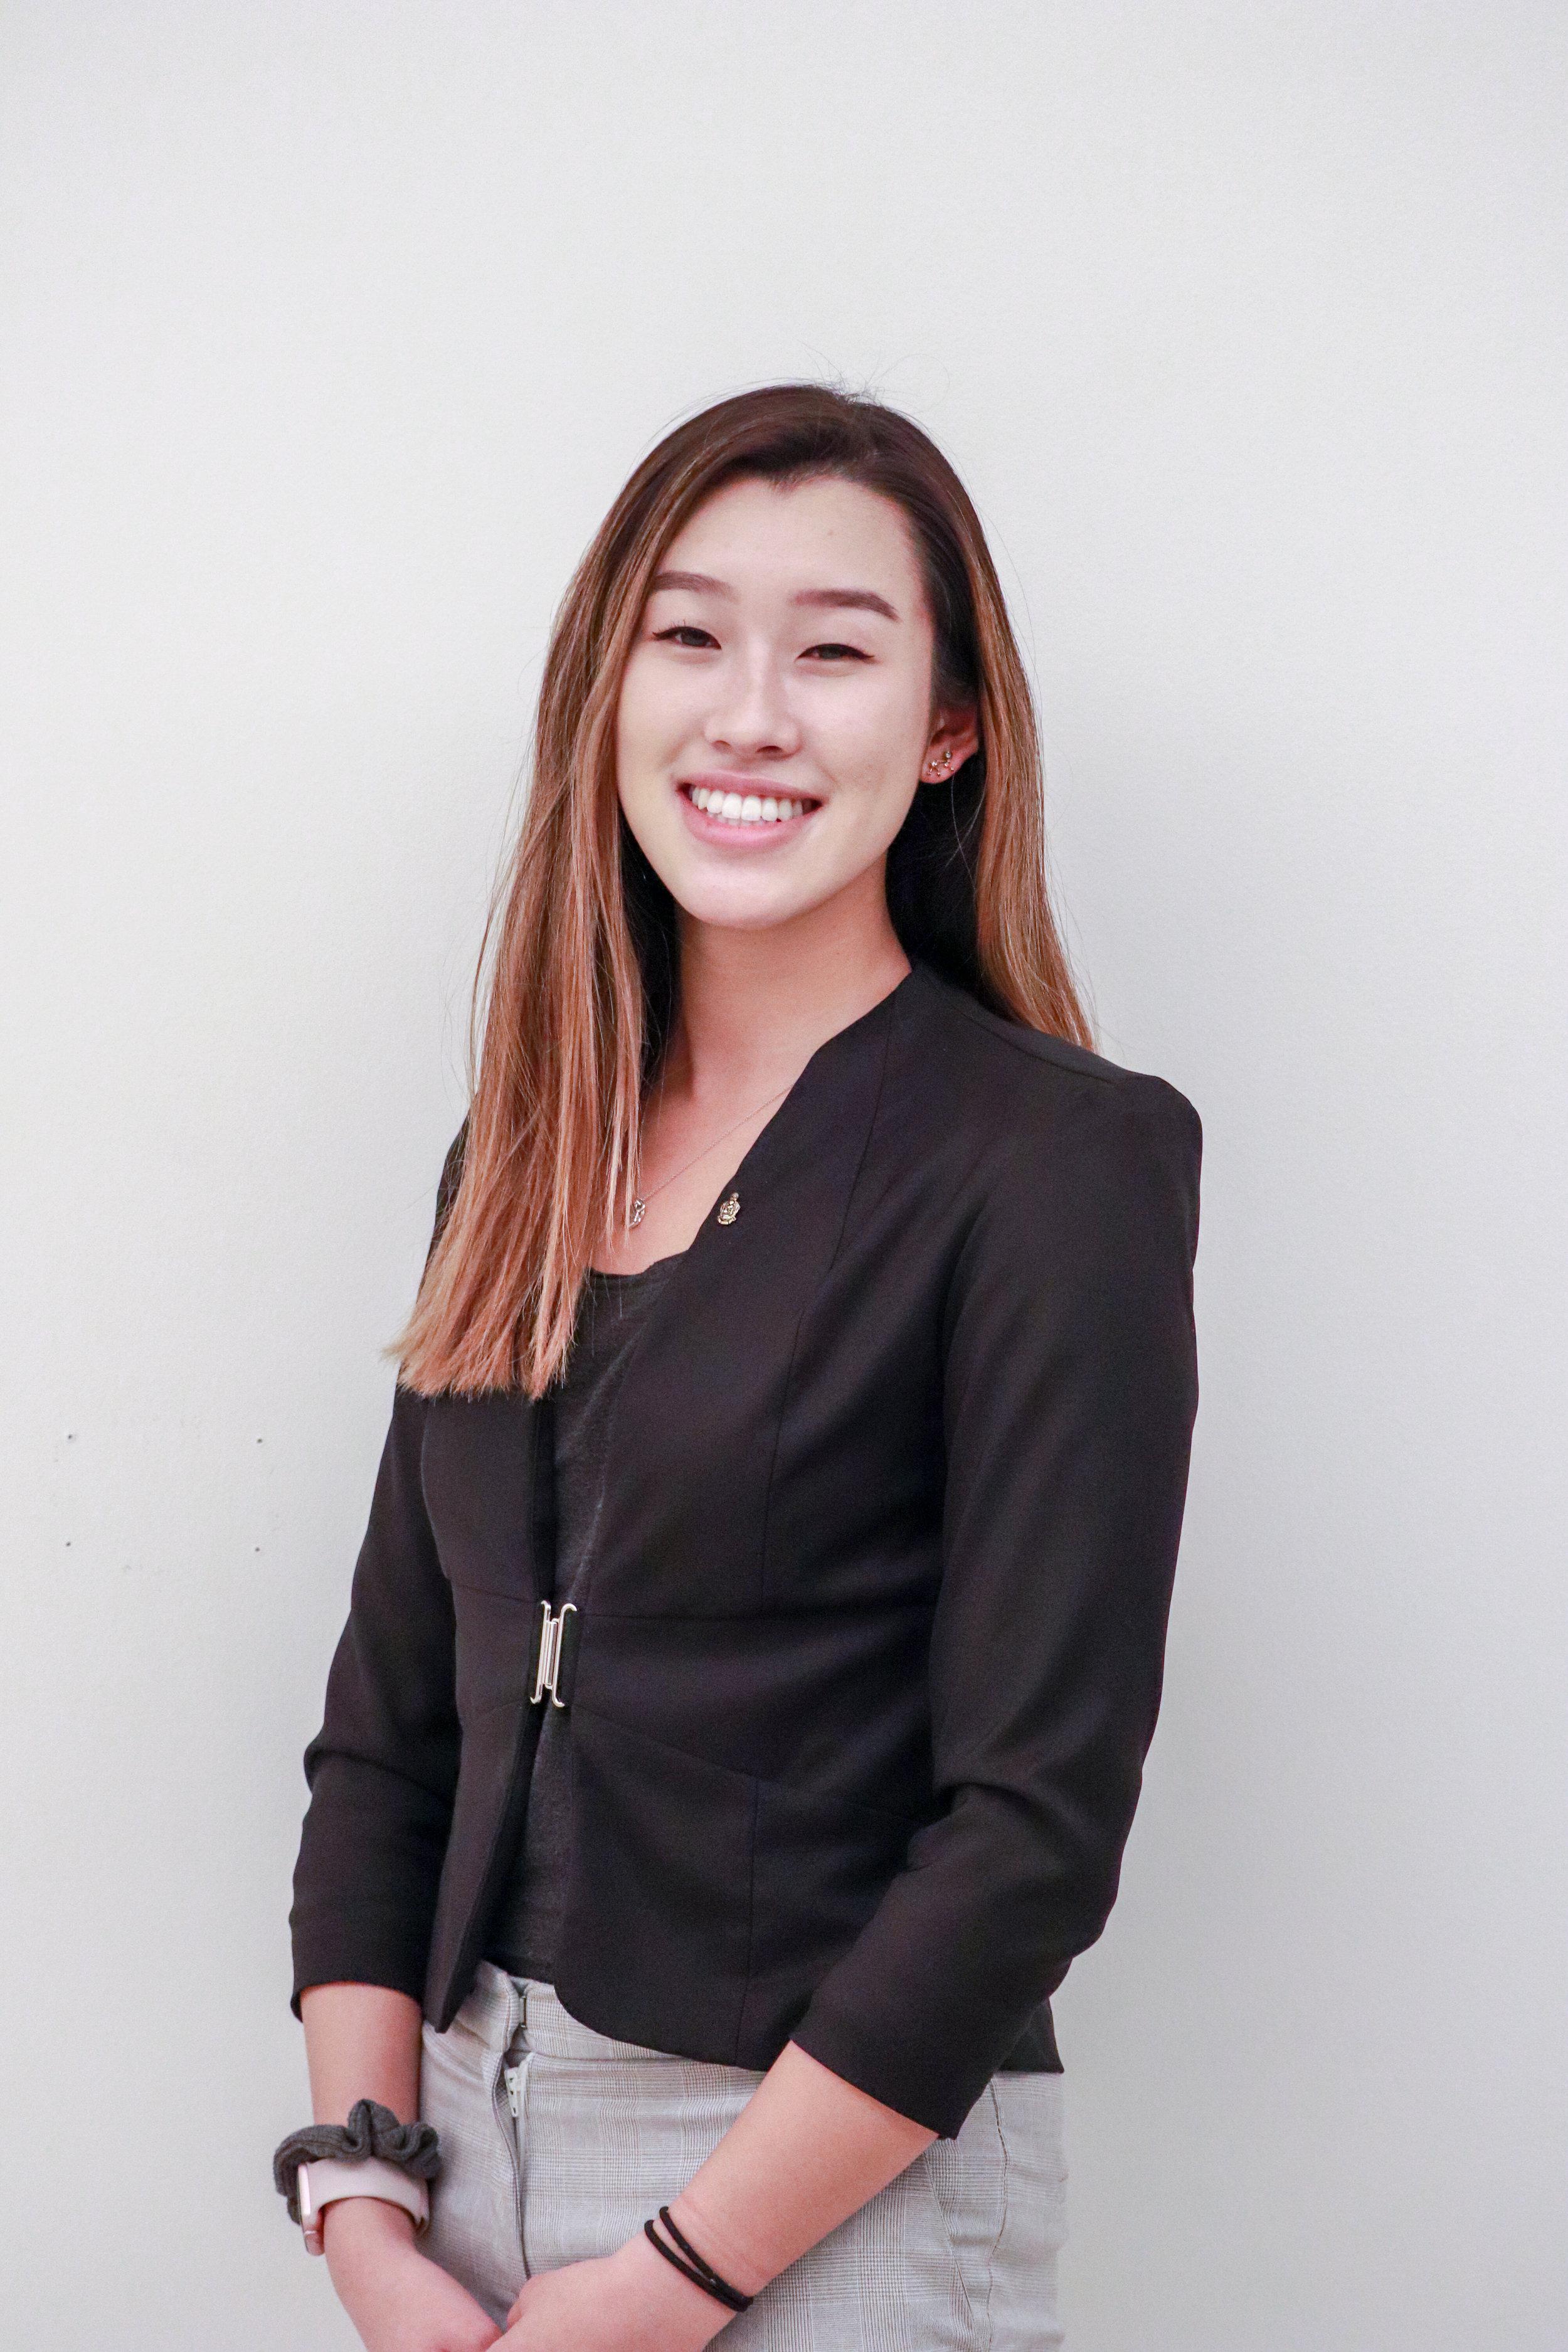 Jessica Zheng